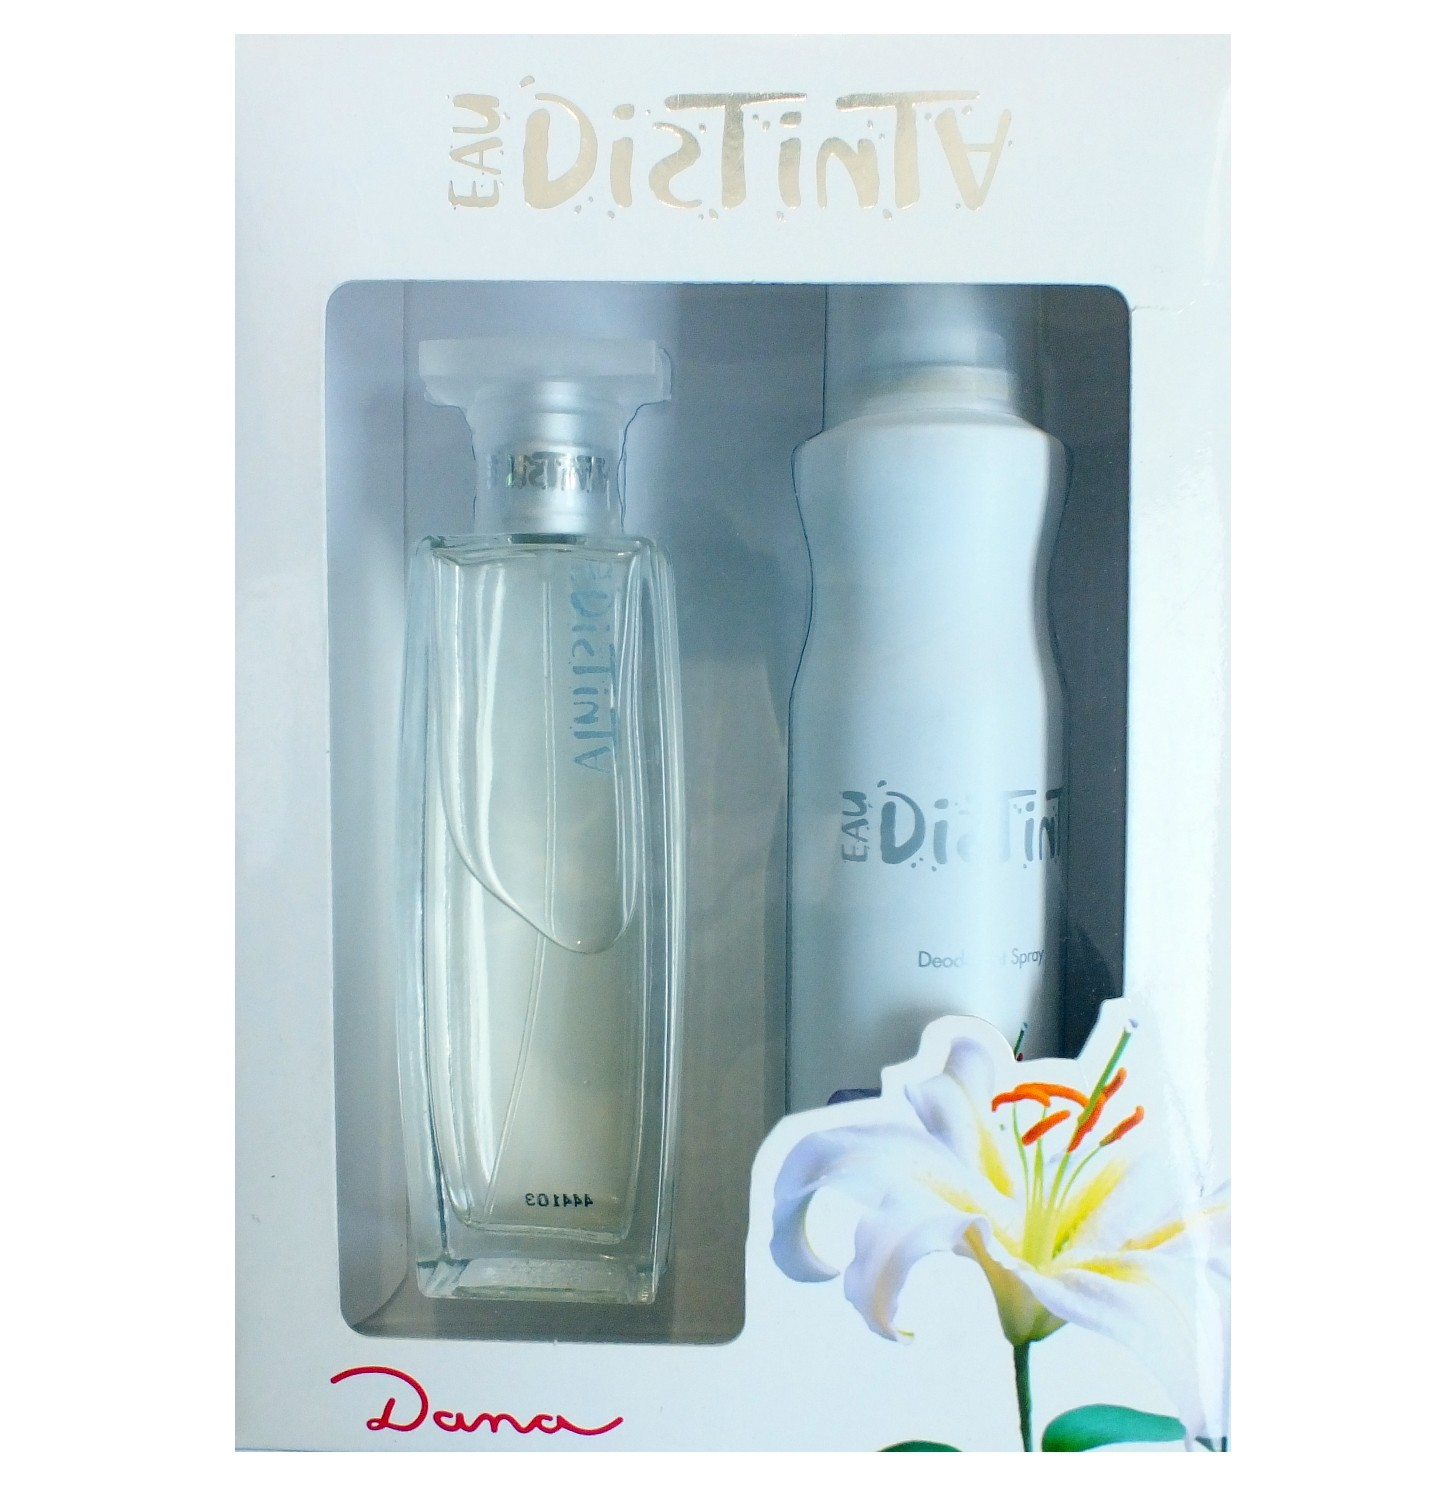 Dana Eau Distinta аромат для женщин